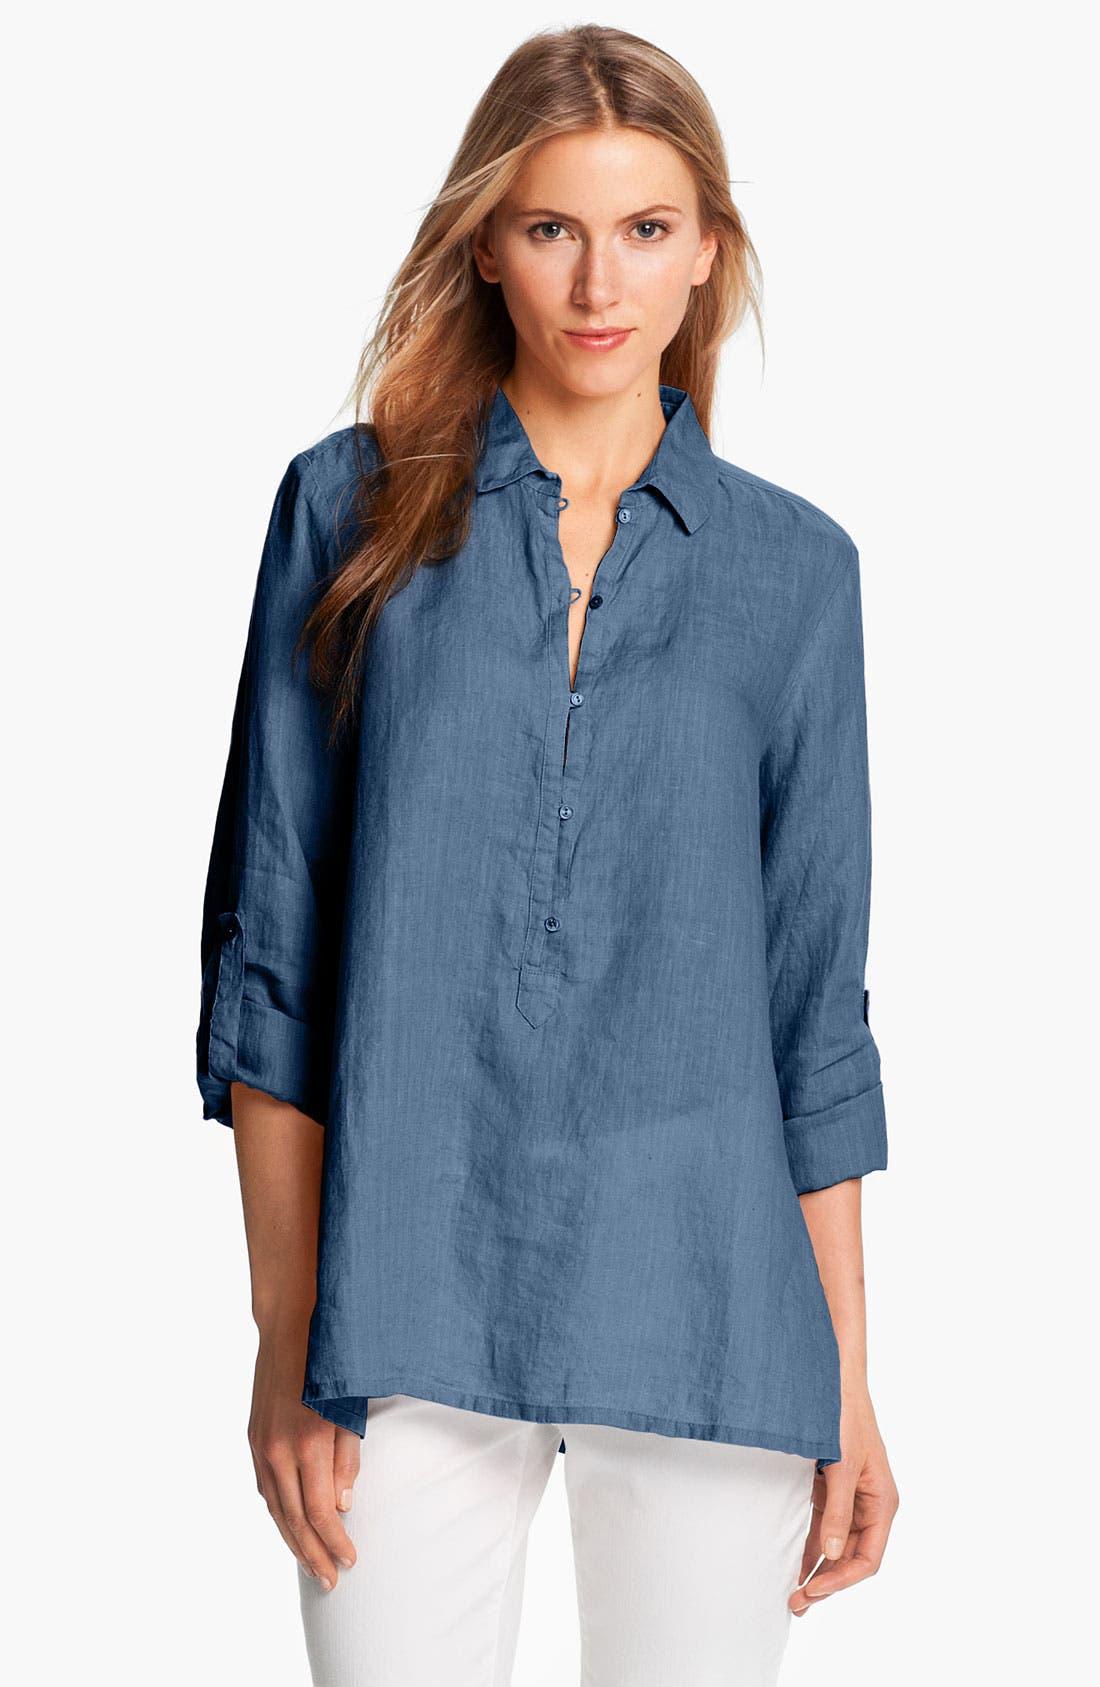 Alternate Image 1 Selected - Eileen Fisher Laundered Handkerchief Linen Shirt